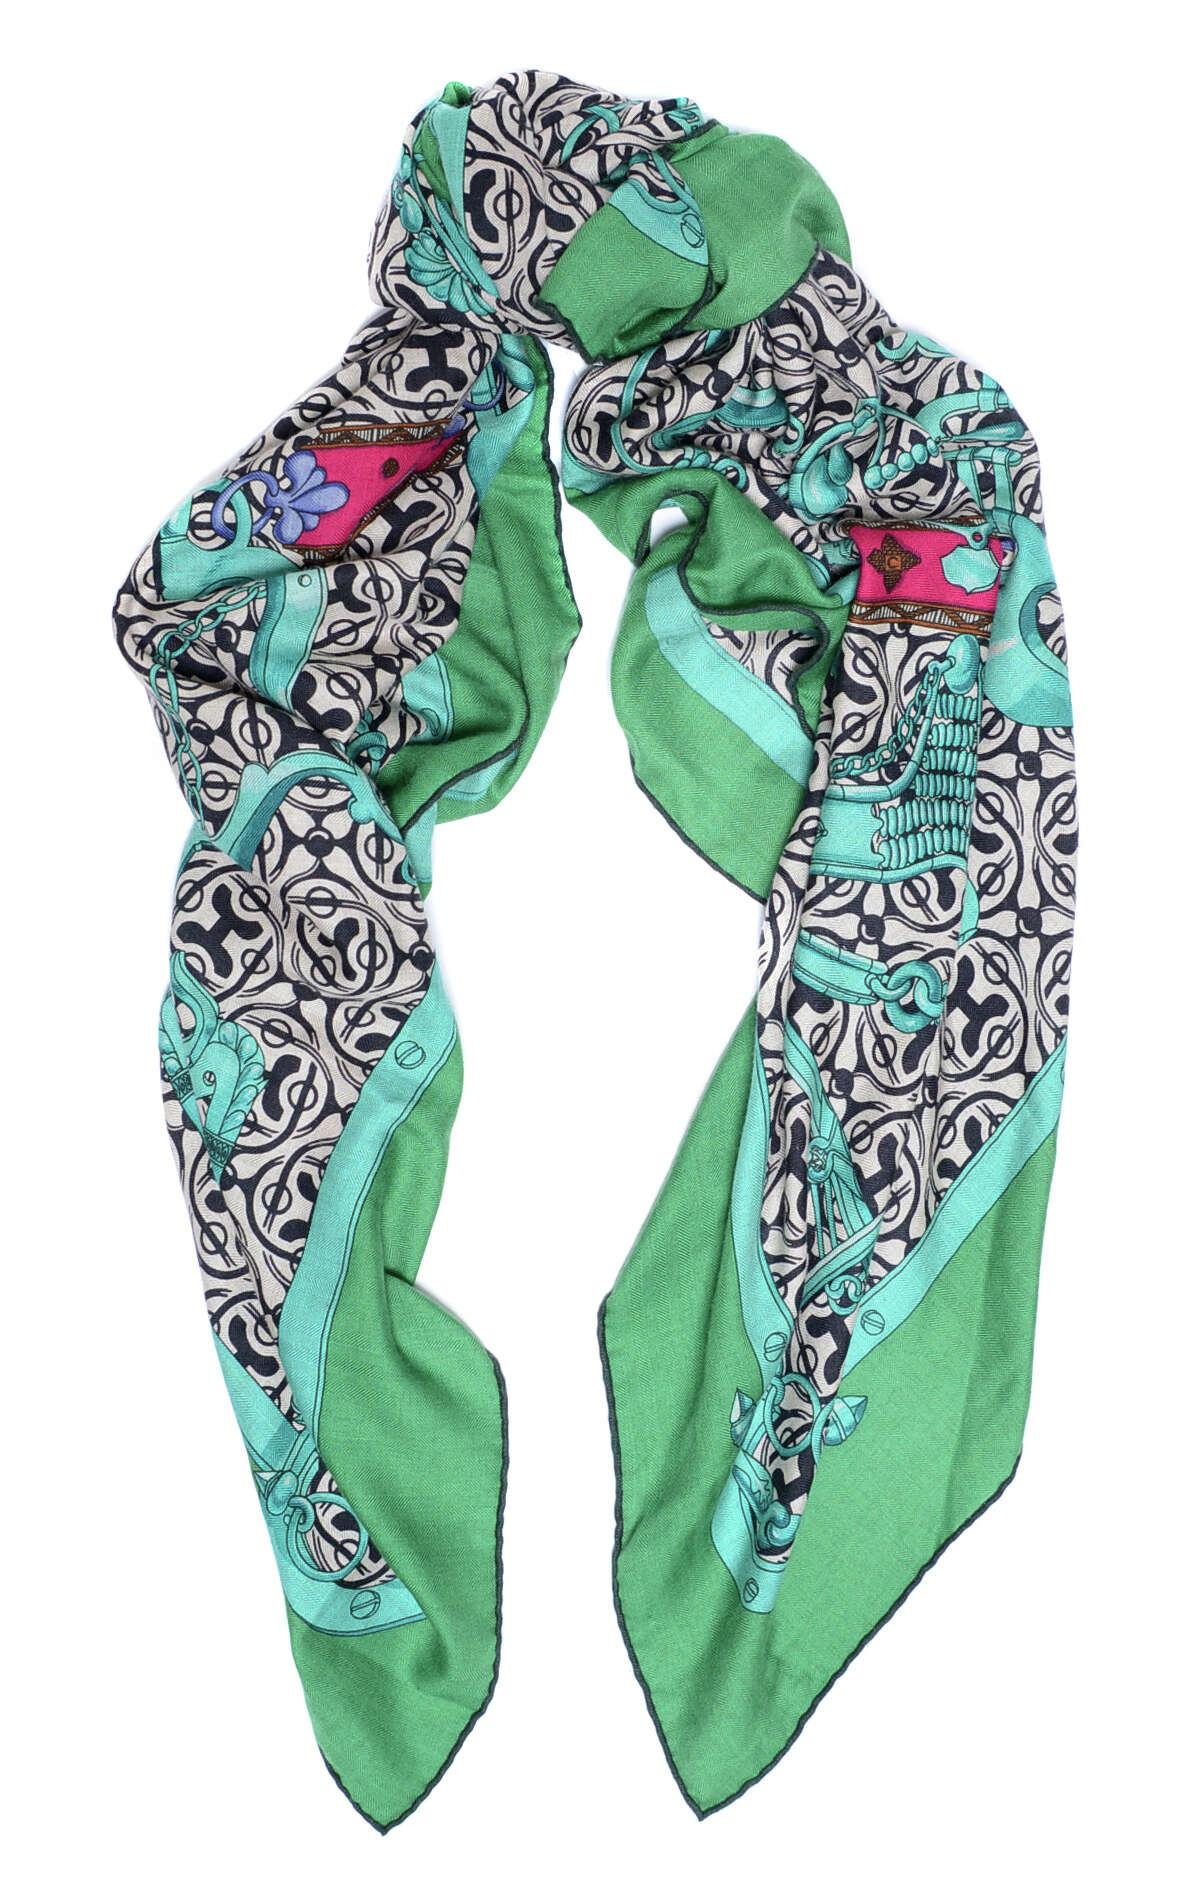 Hermes scarf, $398. Jeremy's Department Store, 2 South Park St., S.F. (415) 882-4929. http://www.jeremys.com.